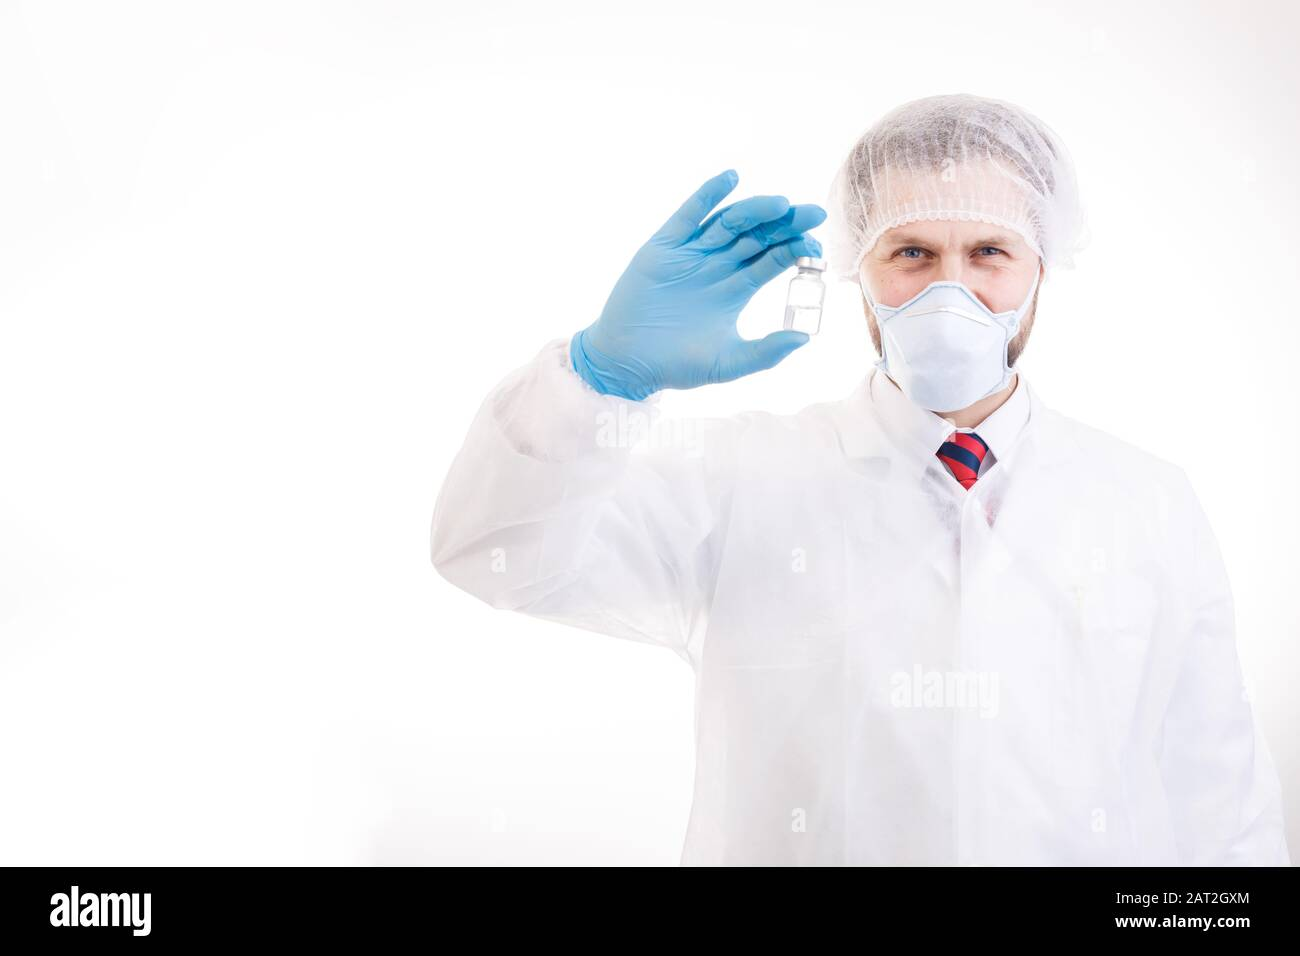 Cheerful Doctor Demonstrating an Antivirus Vaccine Bottle Stock Photo